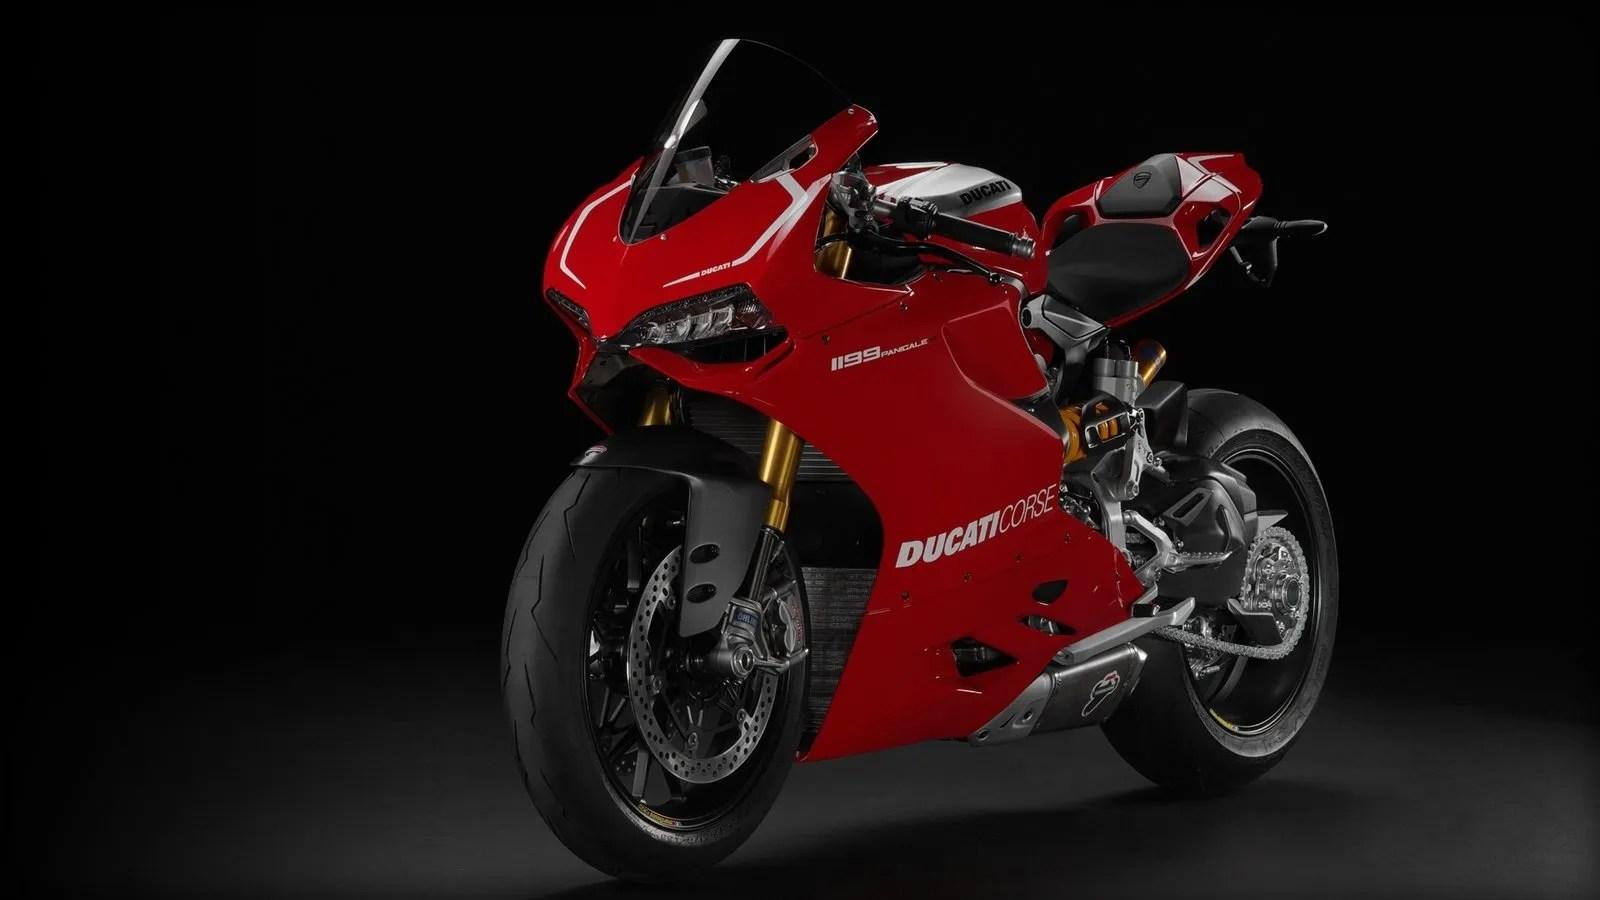 Ducati Superbike Panigale R Pictures Photos